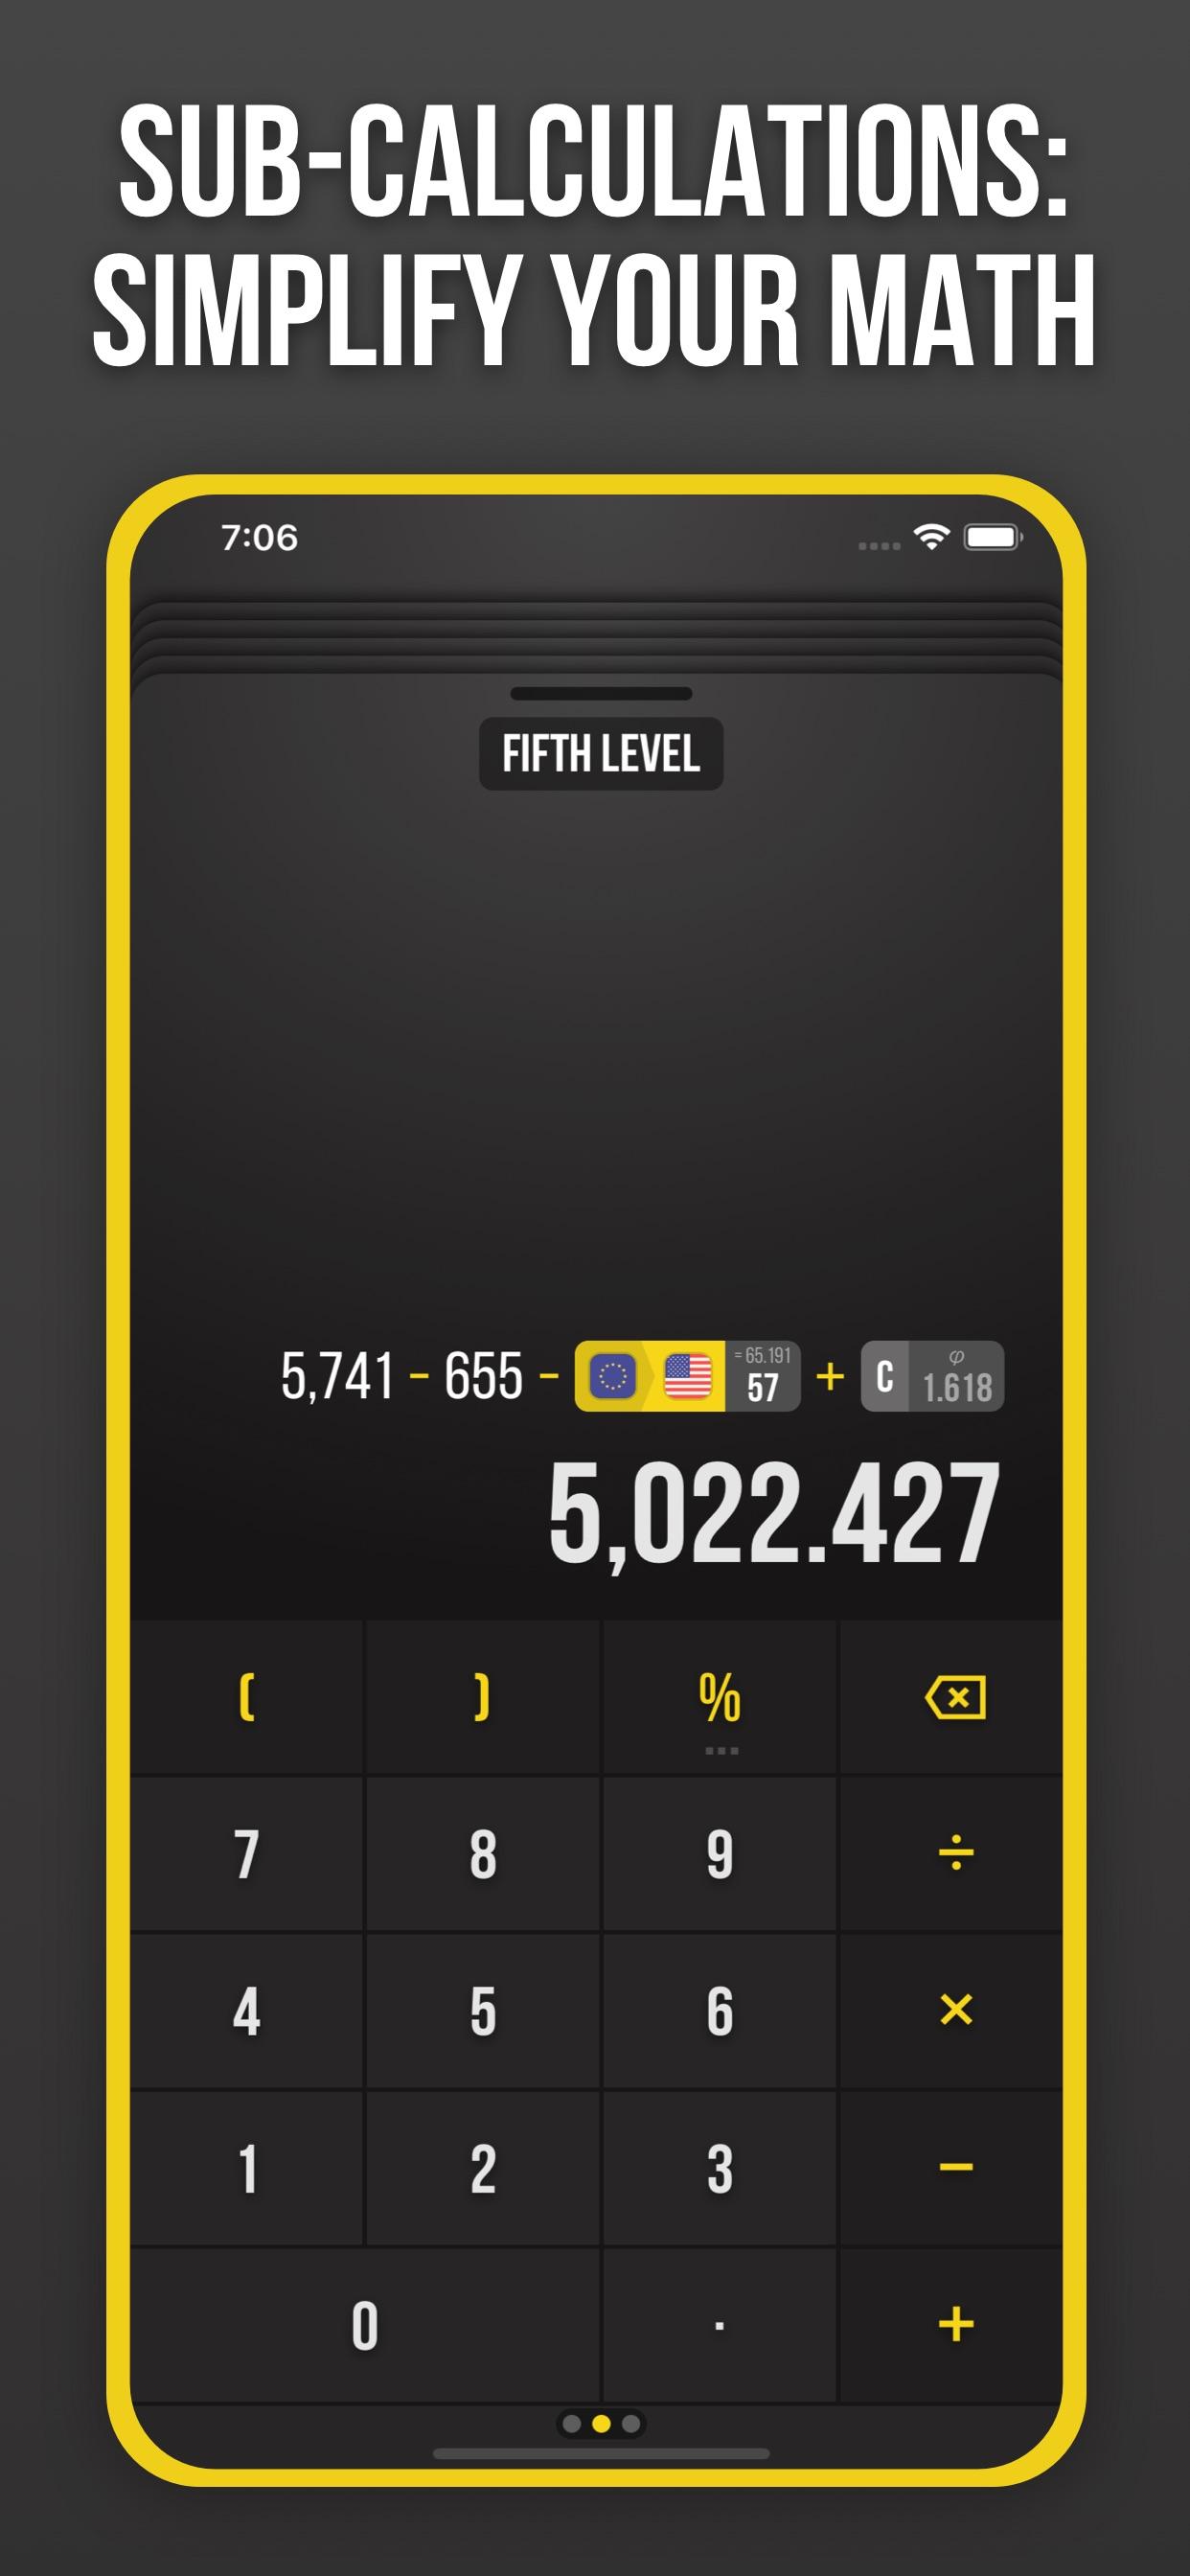 Sub-Calculations: Simplify Your Math